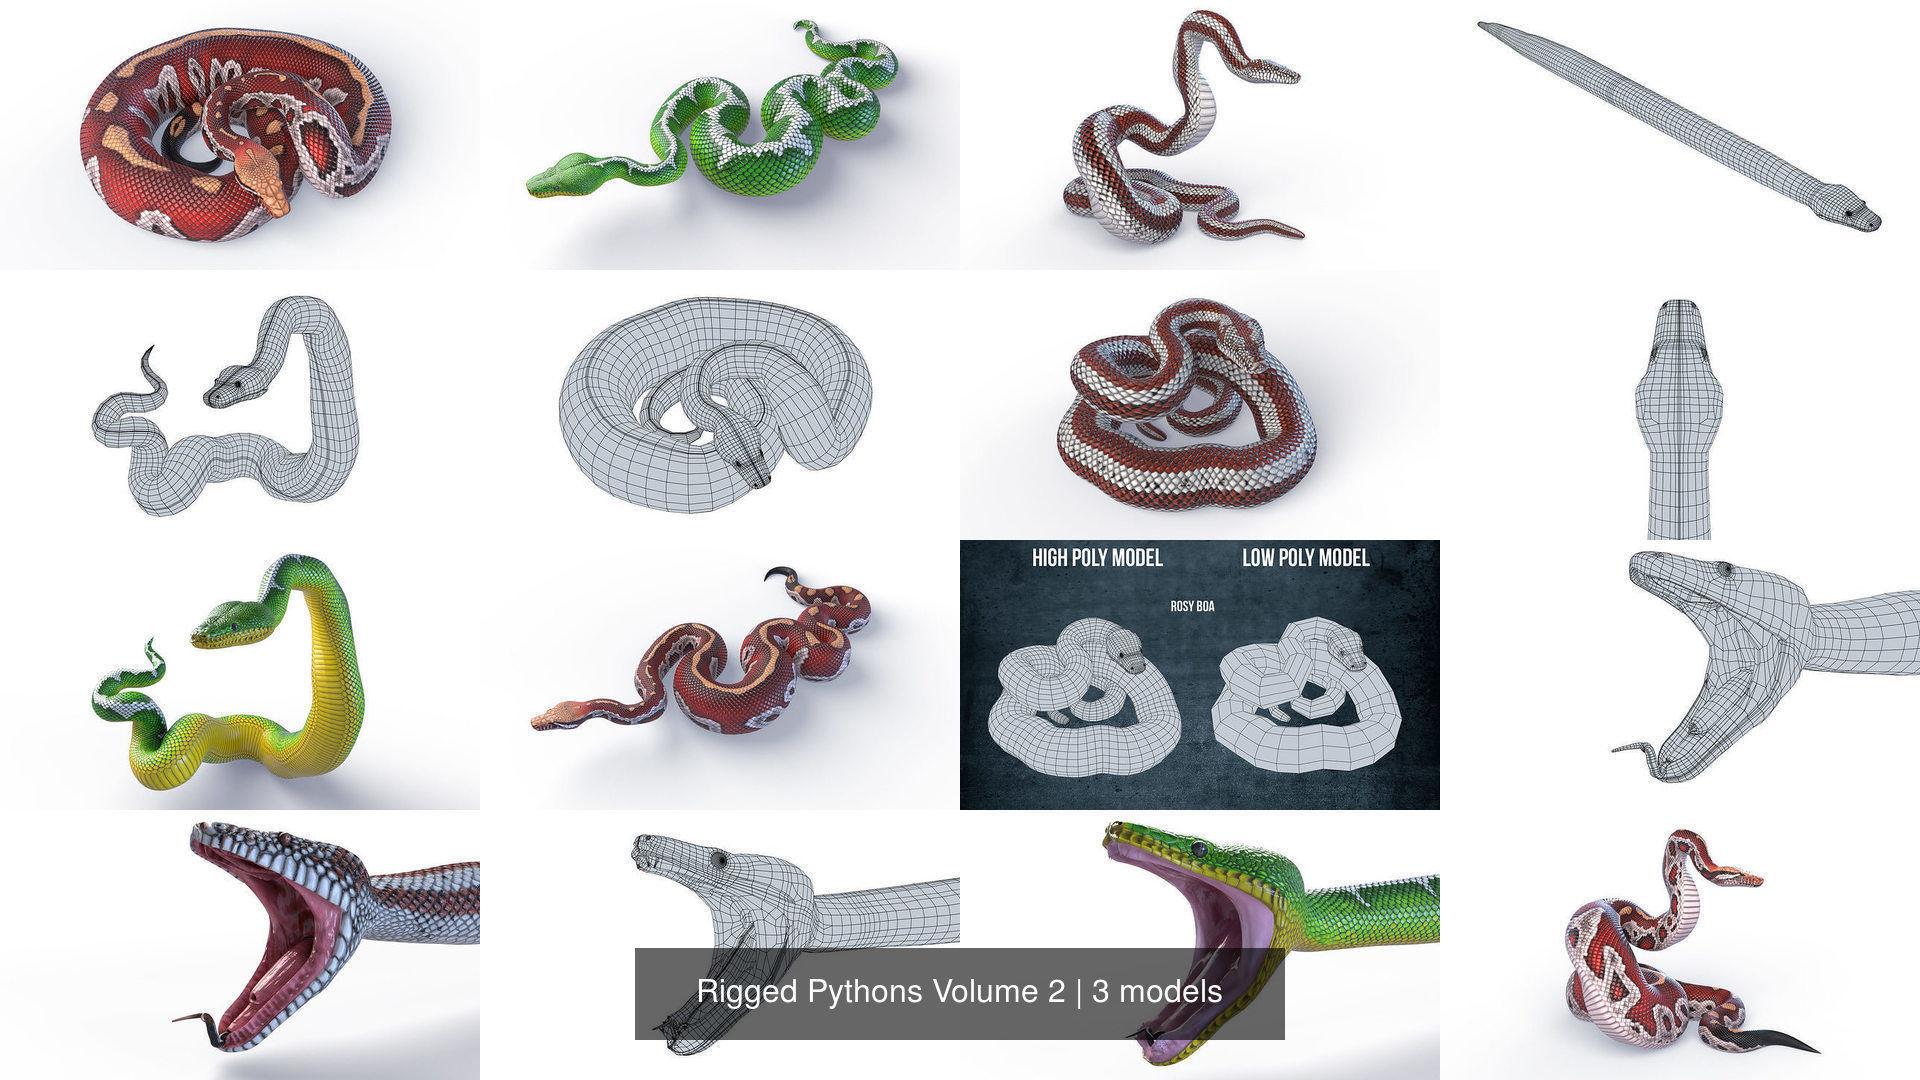 Rigged Pythons Volume 2